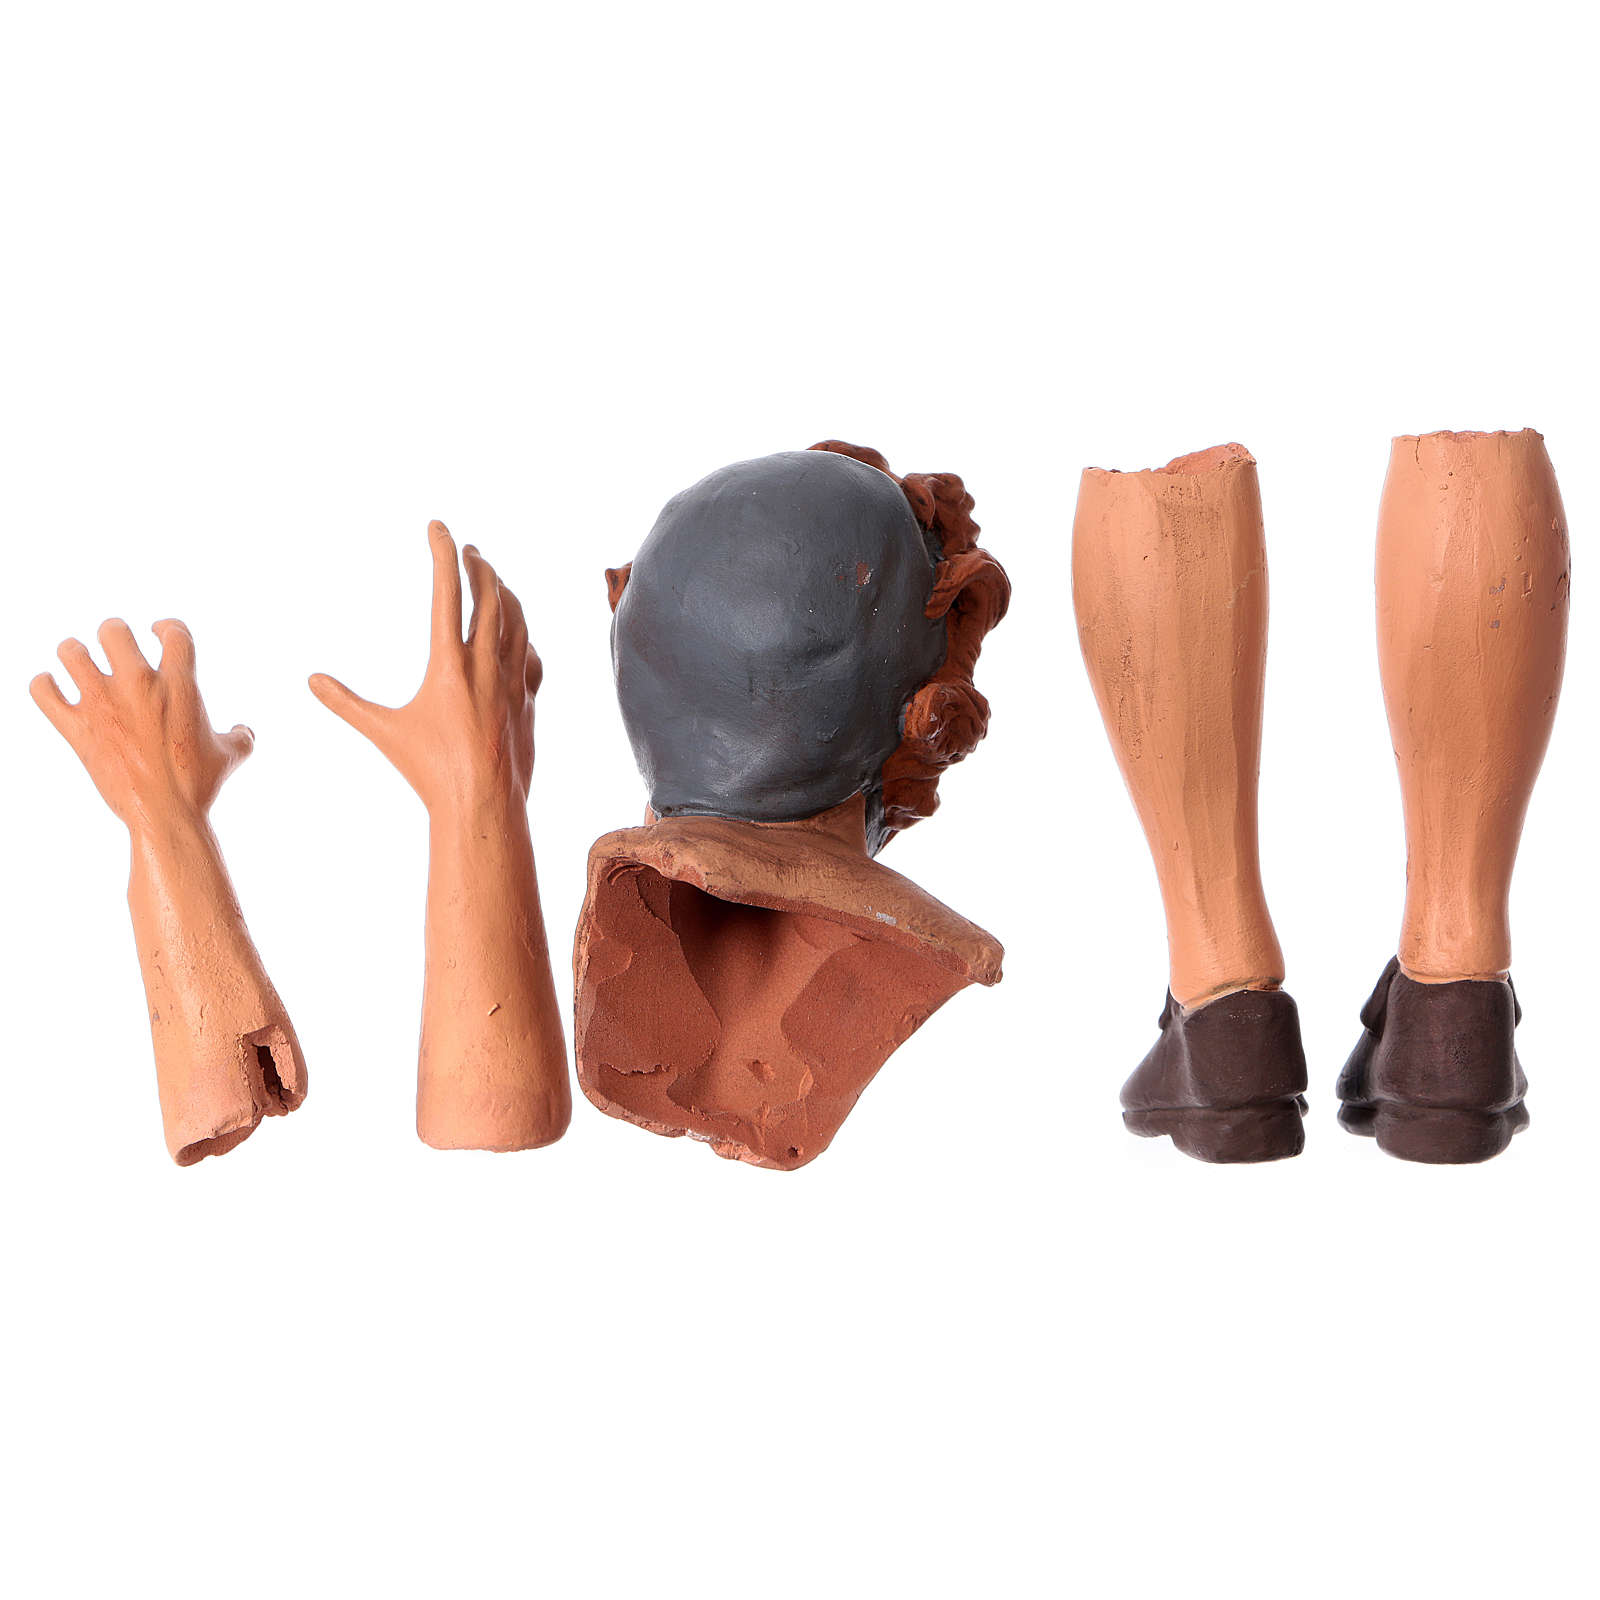 Mani testa piedi terracotta 35 cm Pastore giovane 4